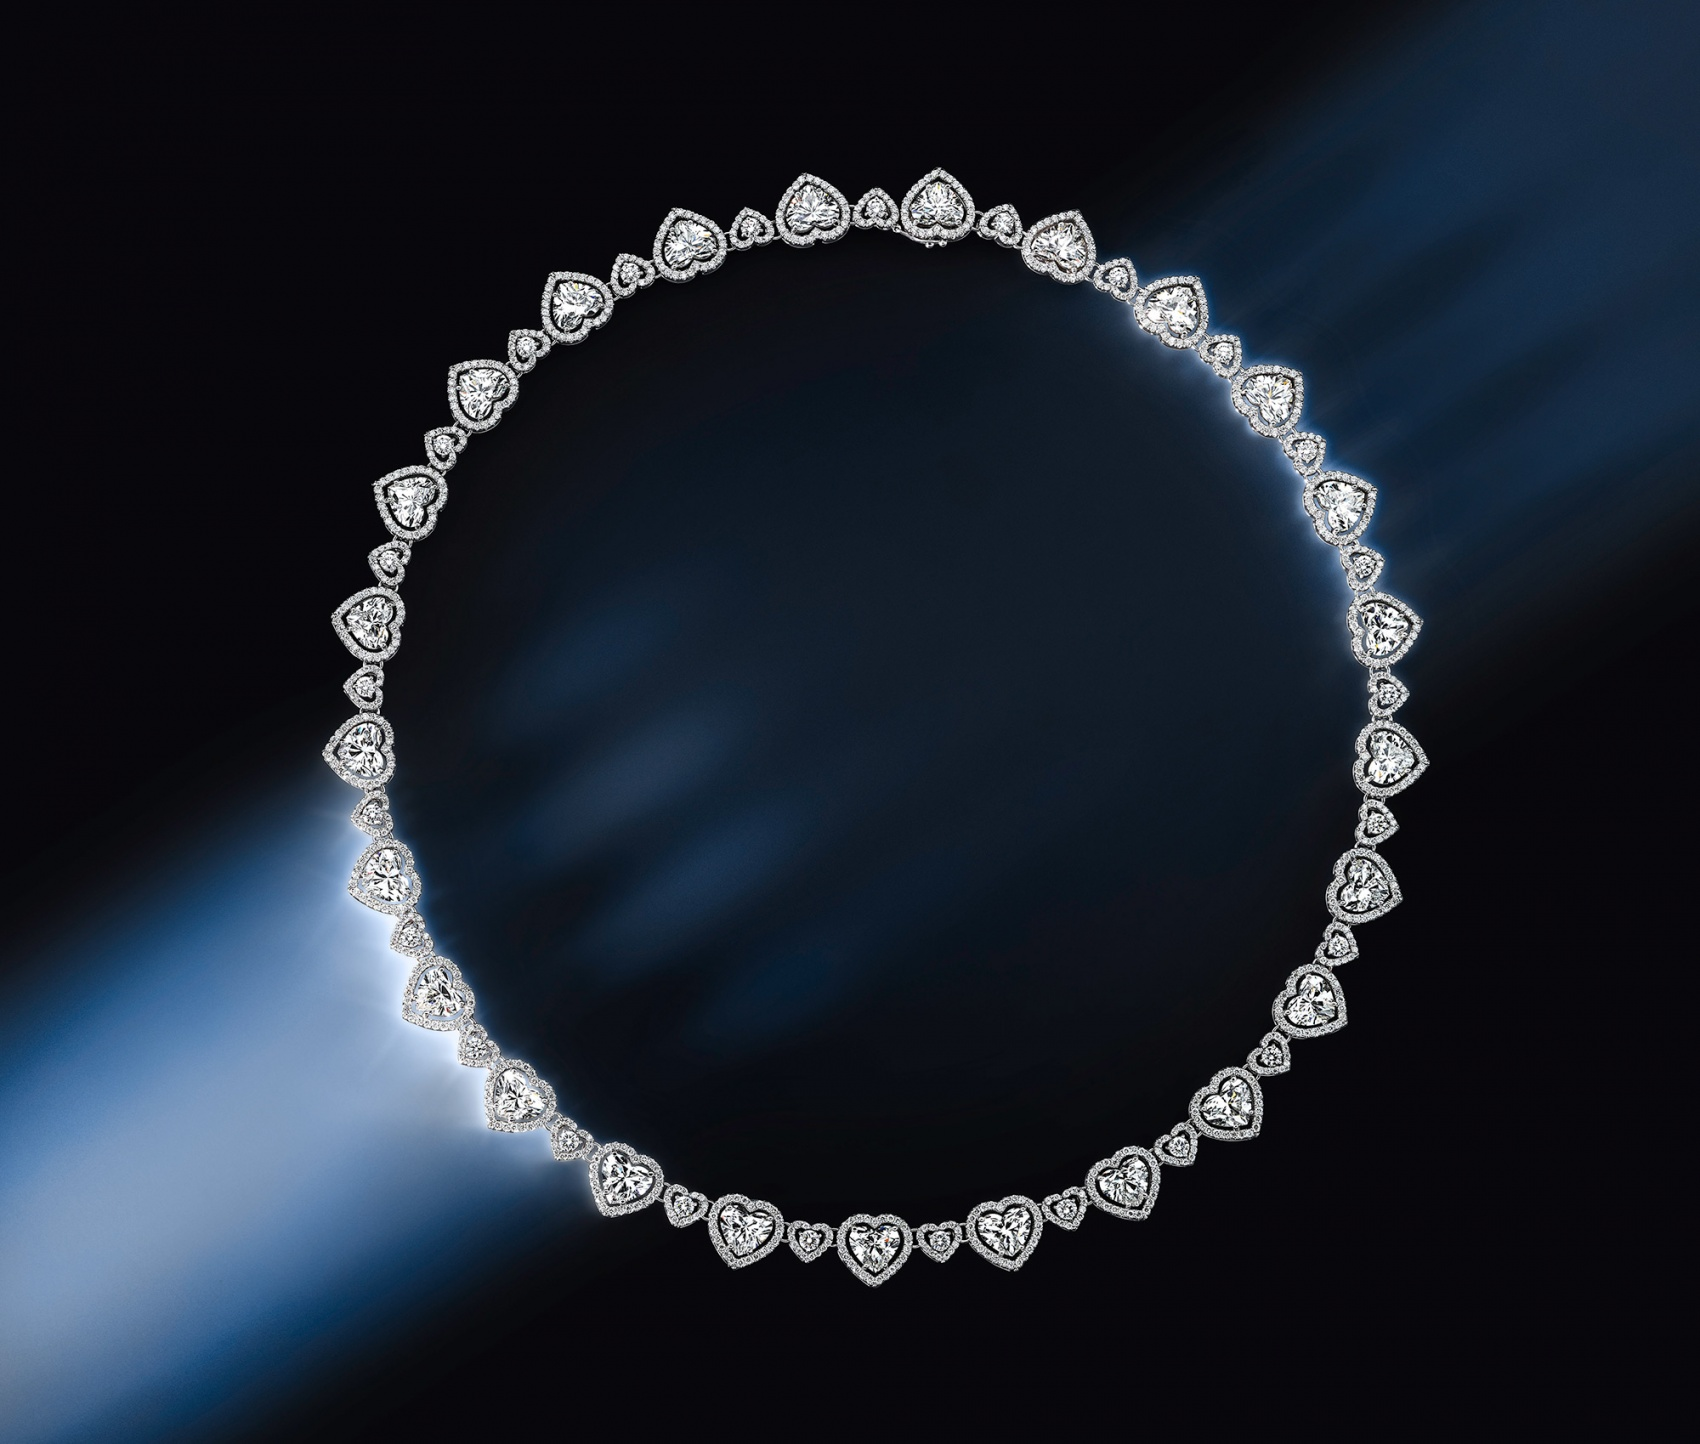 Diamonds_coeur_collier